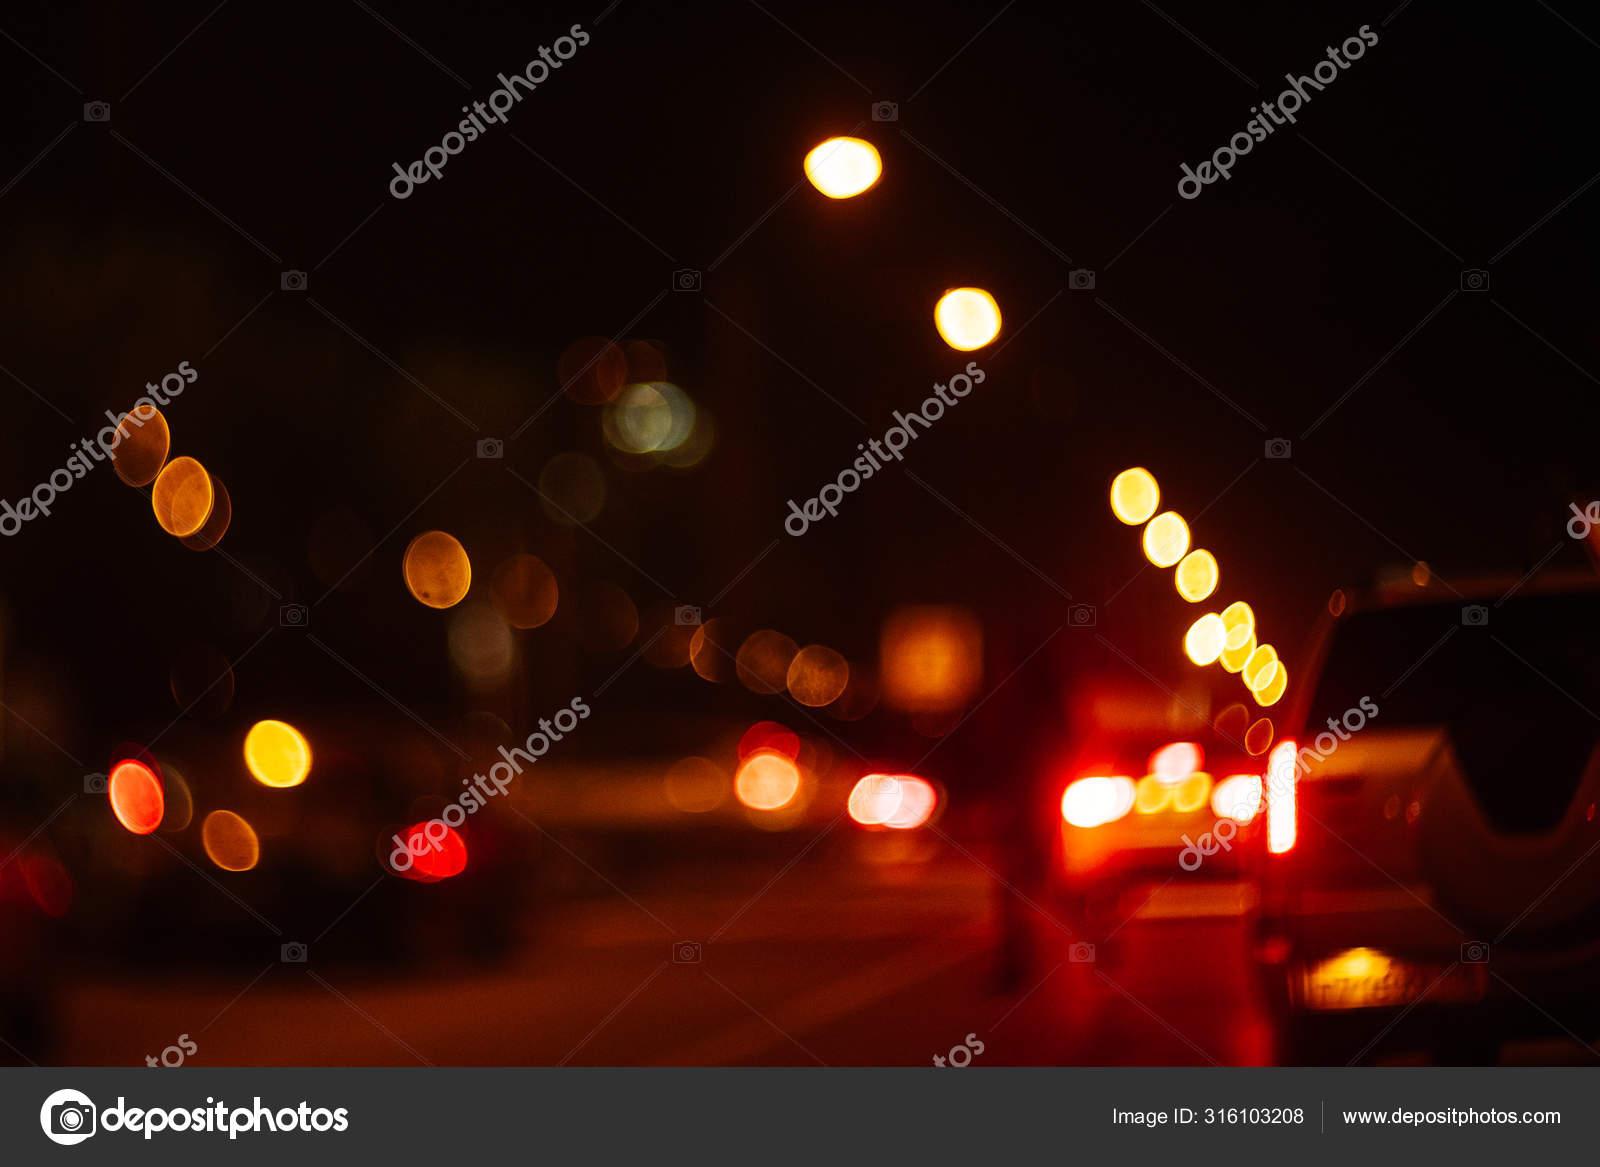 Blur Bokeh Of Car On The Road Blur Traffic At Night Stock Photo C Iamstasivanov Gmail Com 316103208